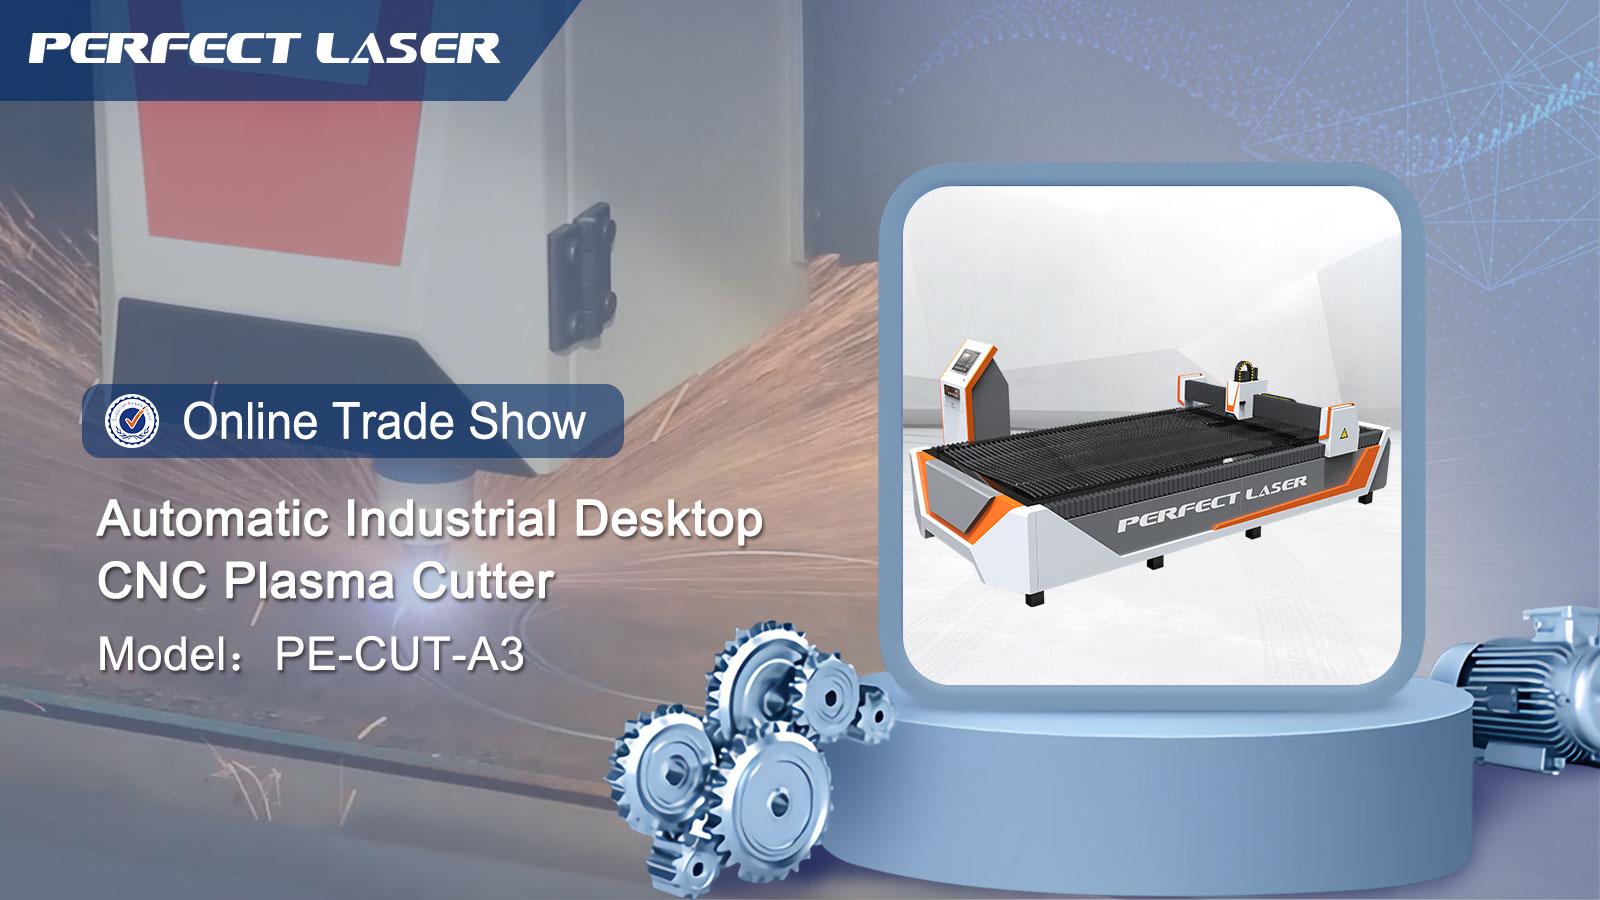 Edelstahl Blatt Metall Rahmen Cnc Plasma Maschine Cutter